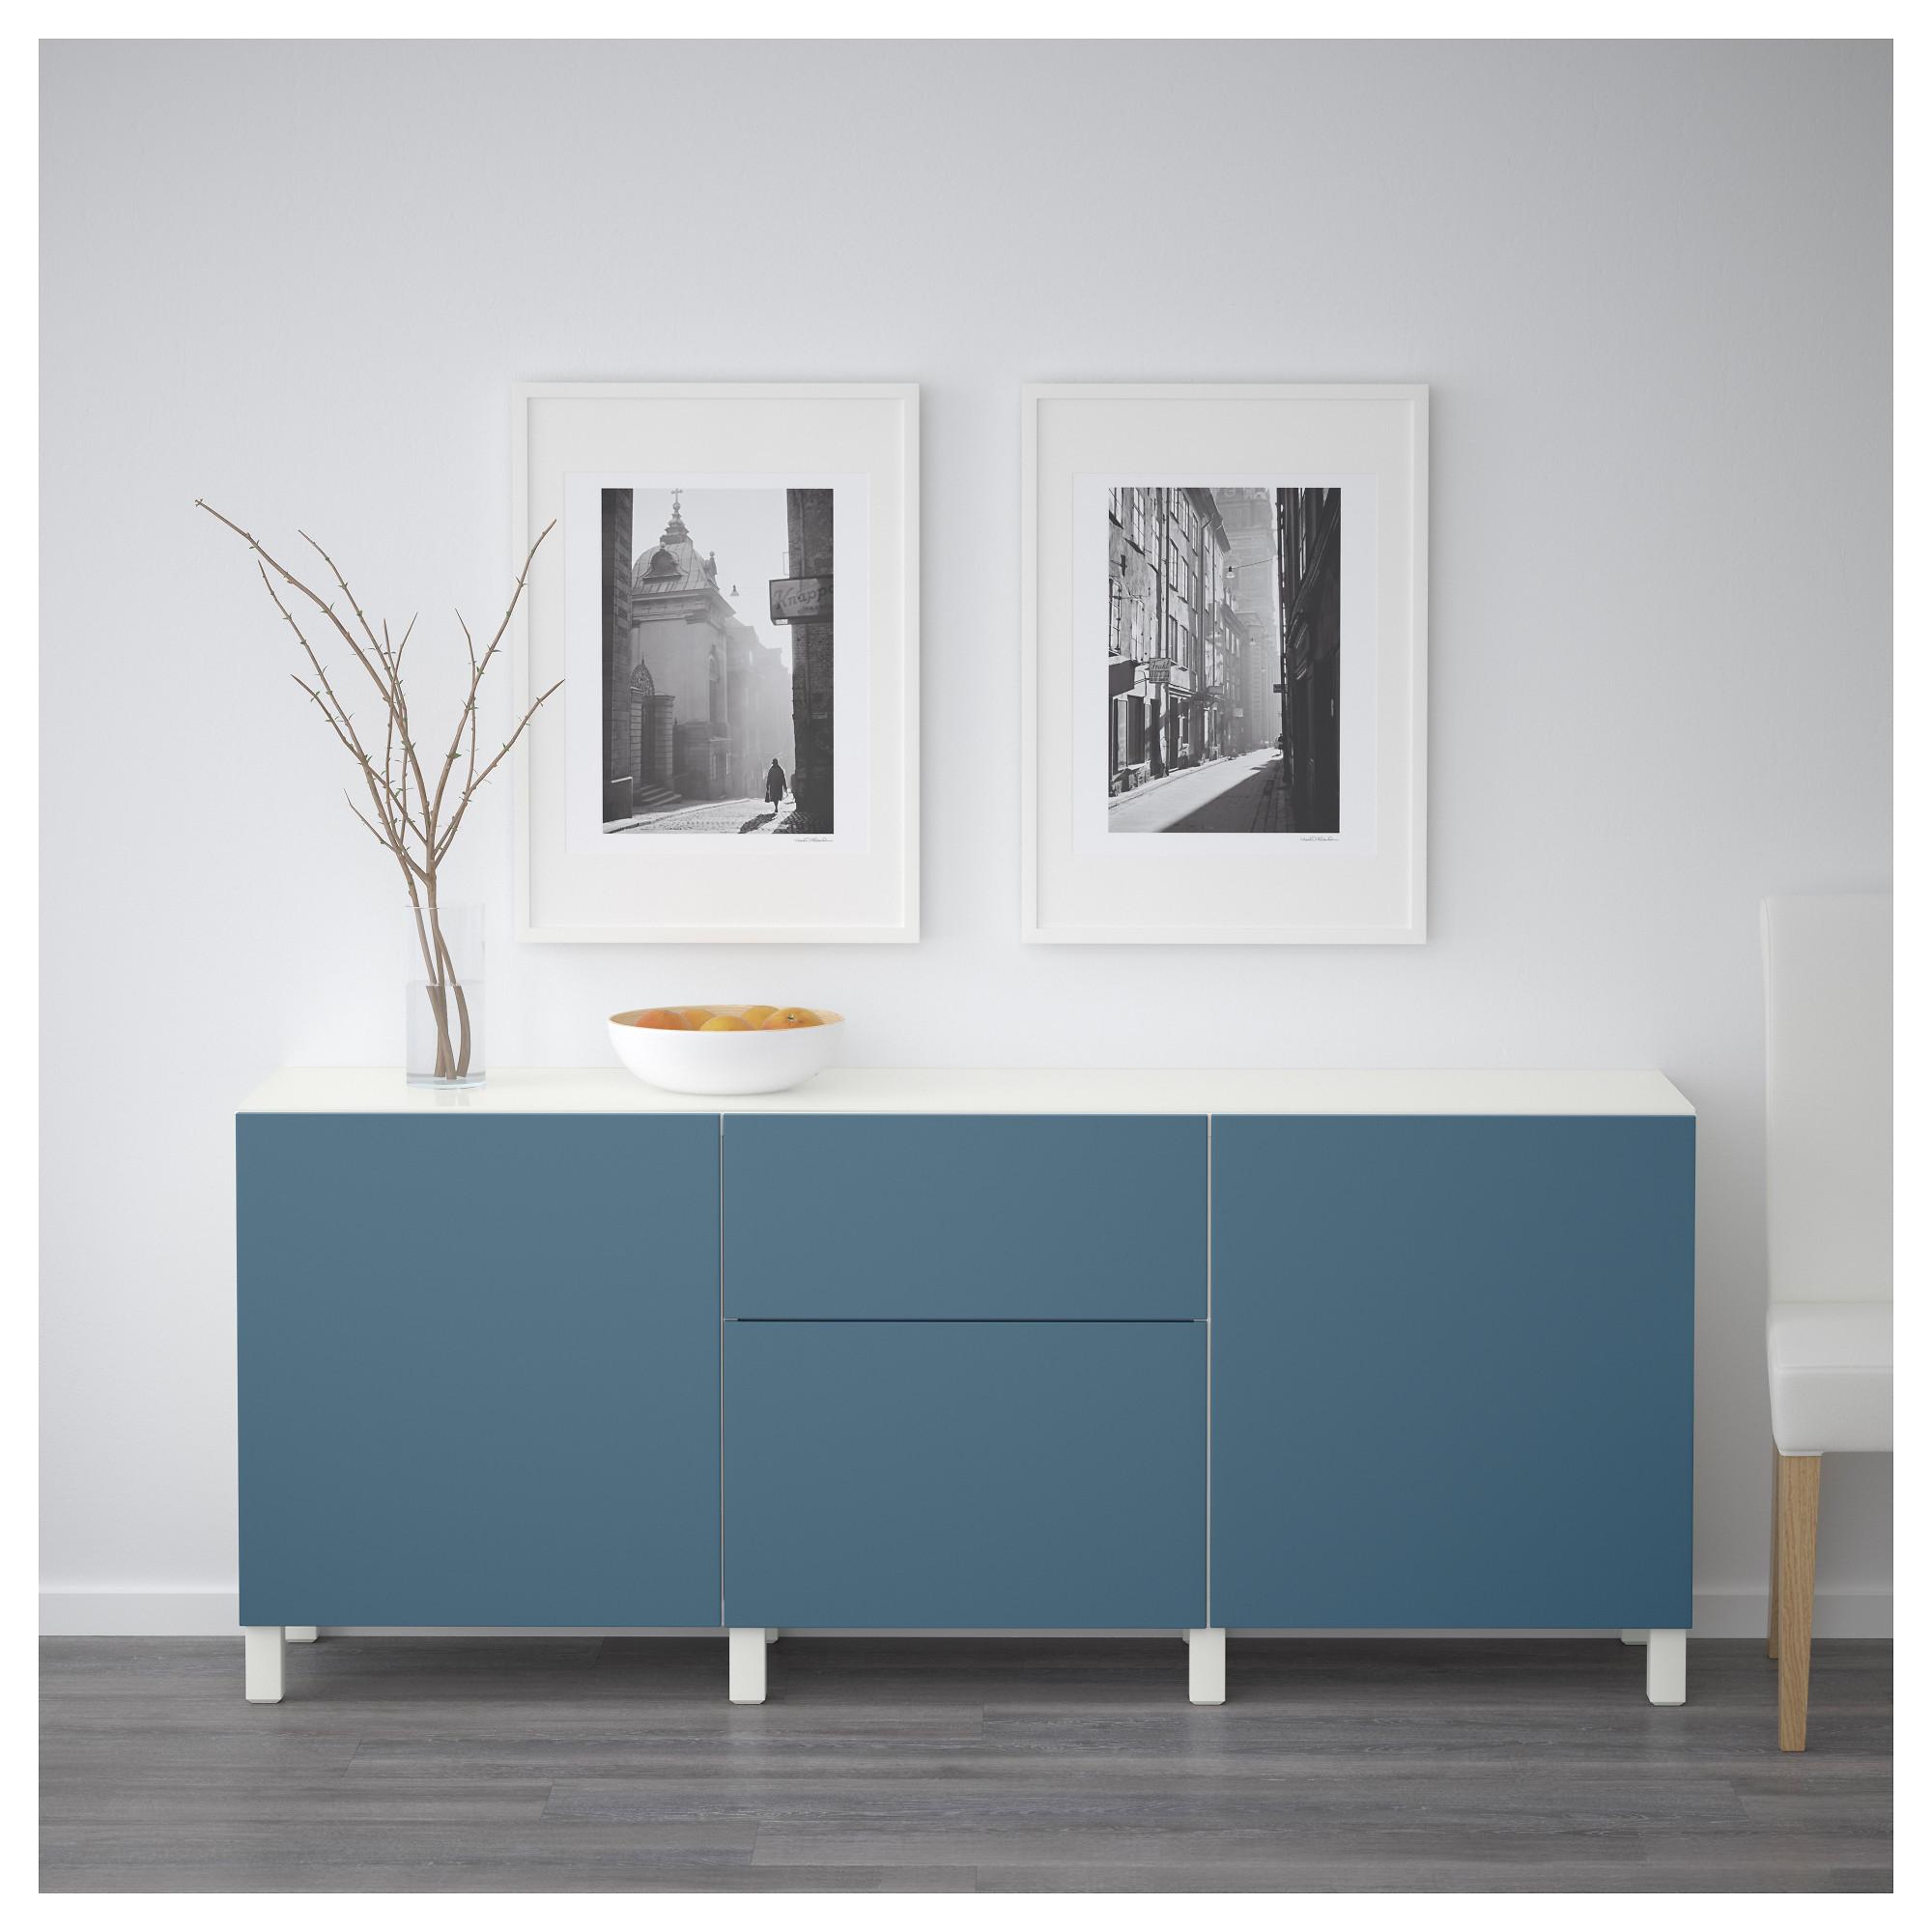 Комбинация для хранения с дверцами, ящиками БЕСТО темно-синий артикуль № 692.462.74 в наличии. Online магазин IKEA Республика Беларусь. Недорогая доставка и установка.